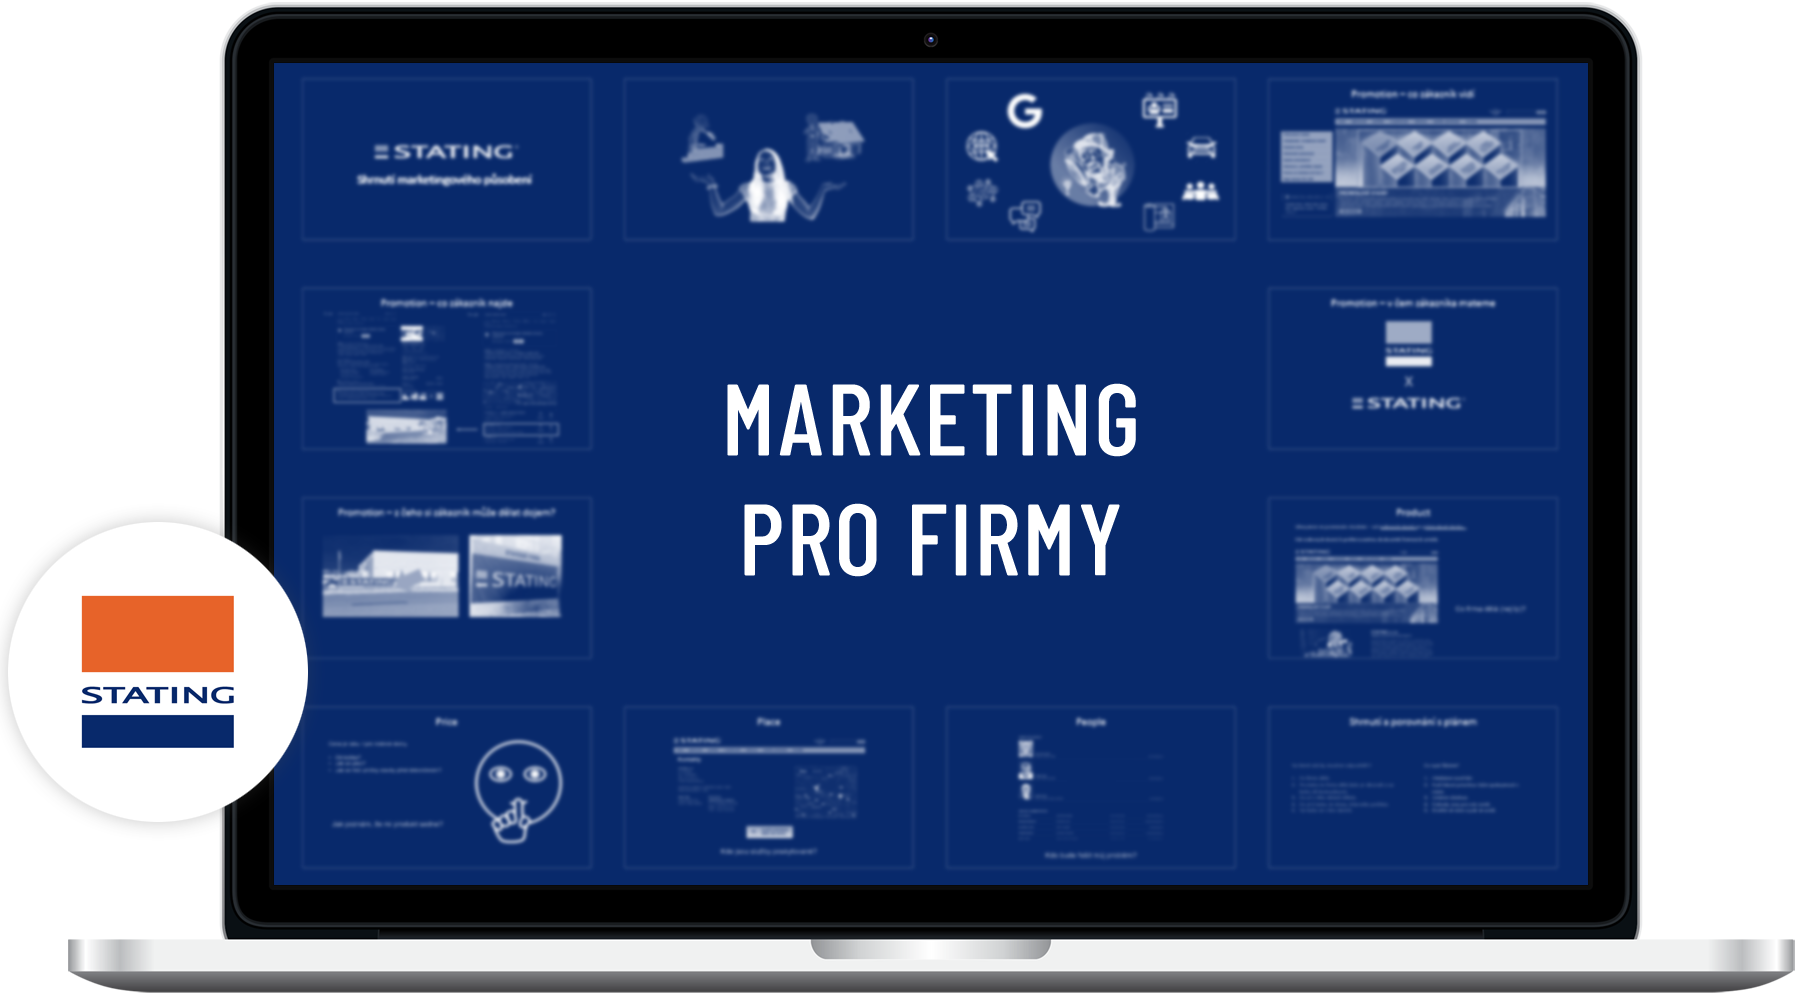 Marketing pro firmy – reference